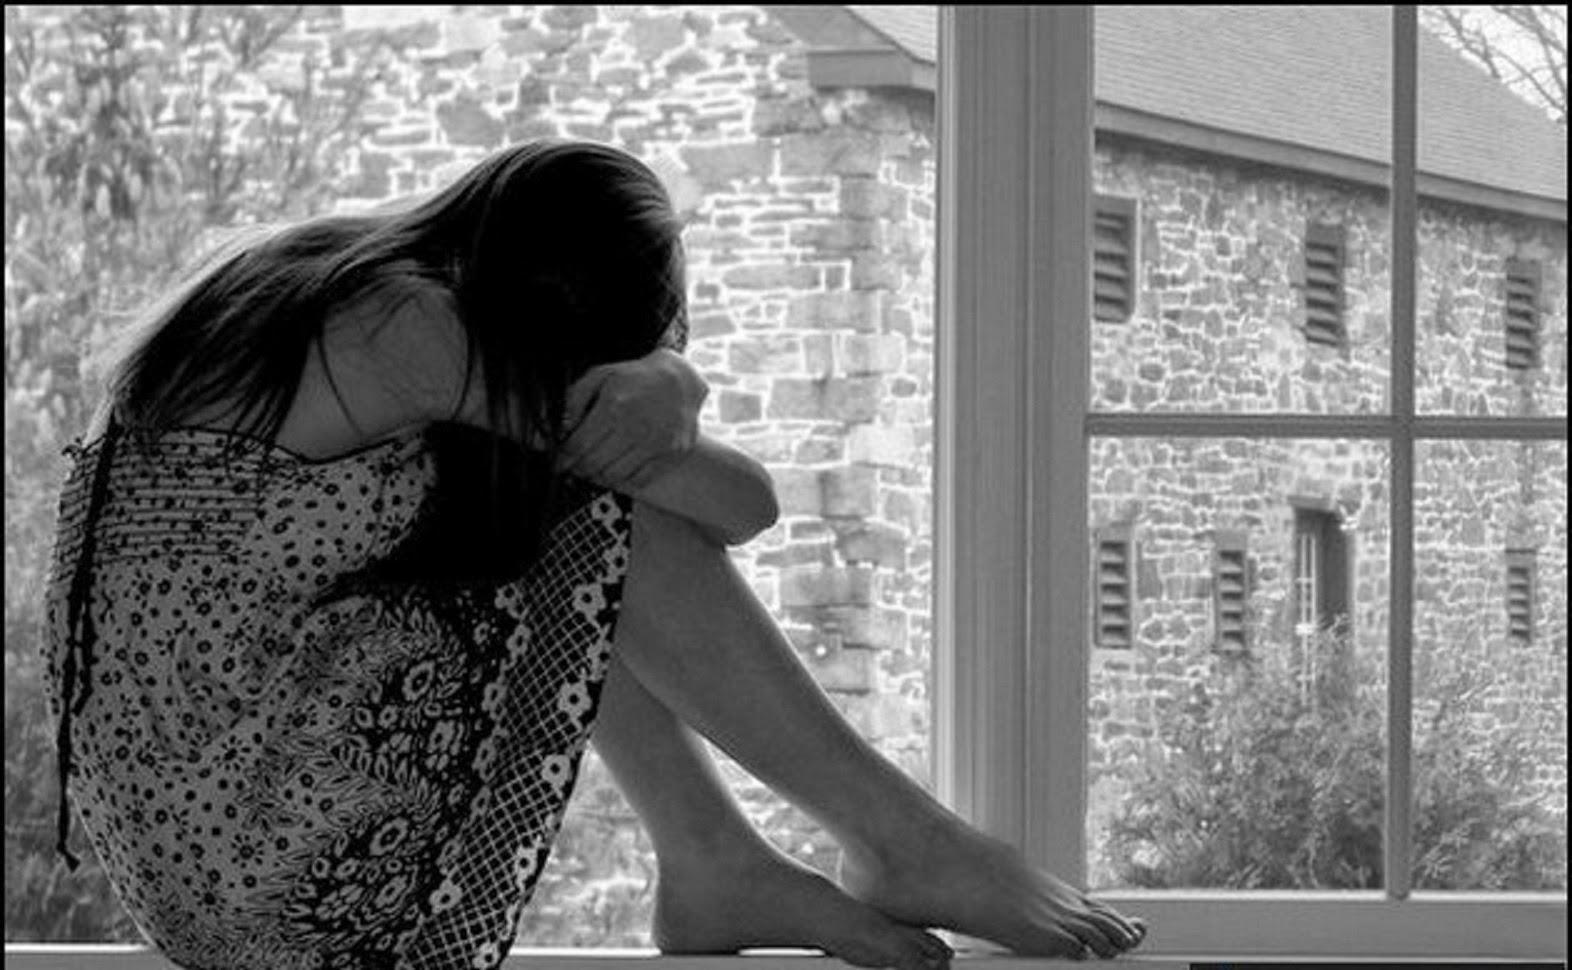 Sad Alone Romantic Cute Love Couple Wallpaper Wallpaper Galeries Facebook Cover Lonely Girl Hd